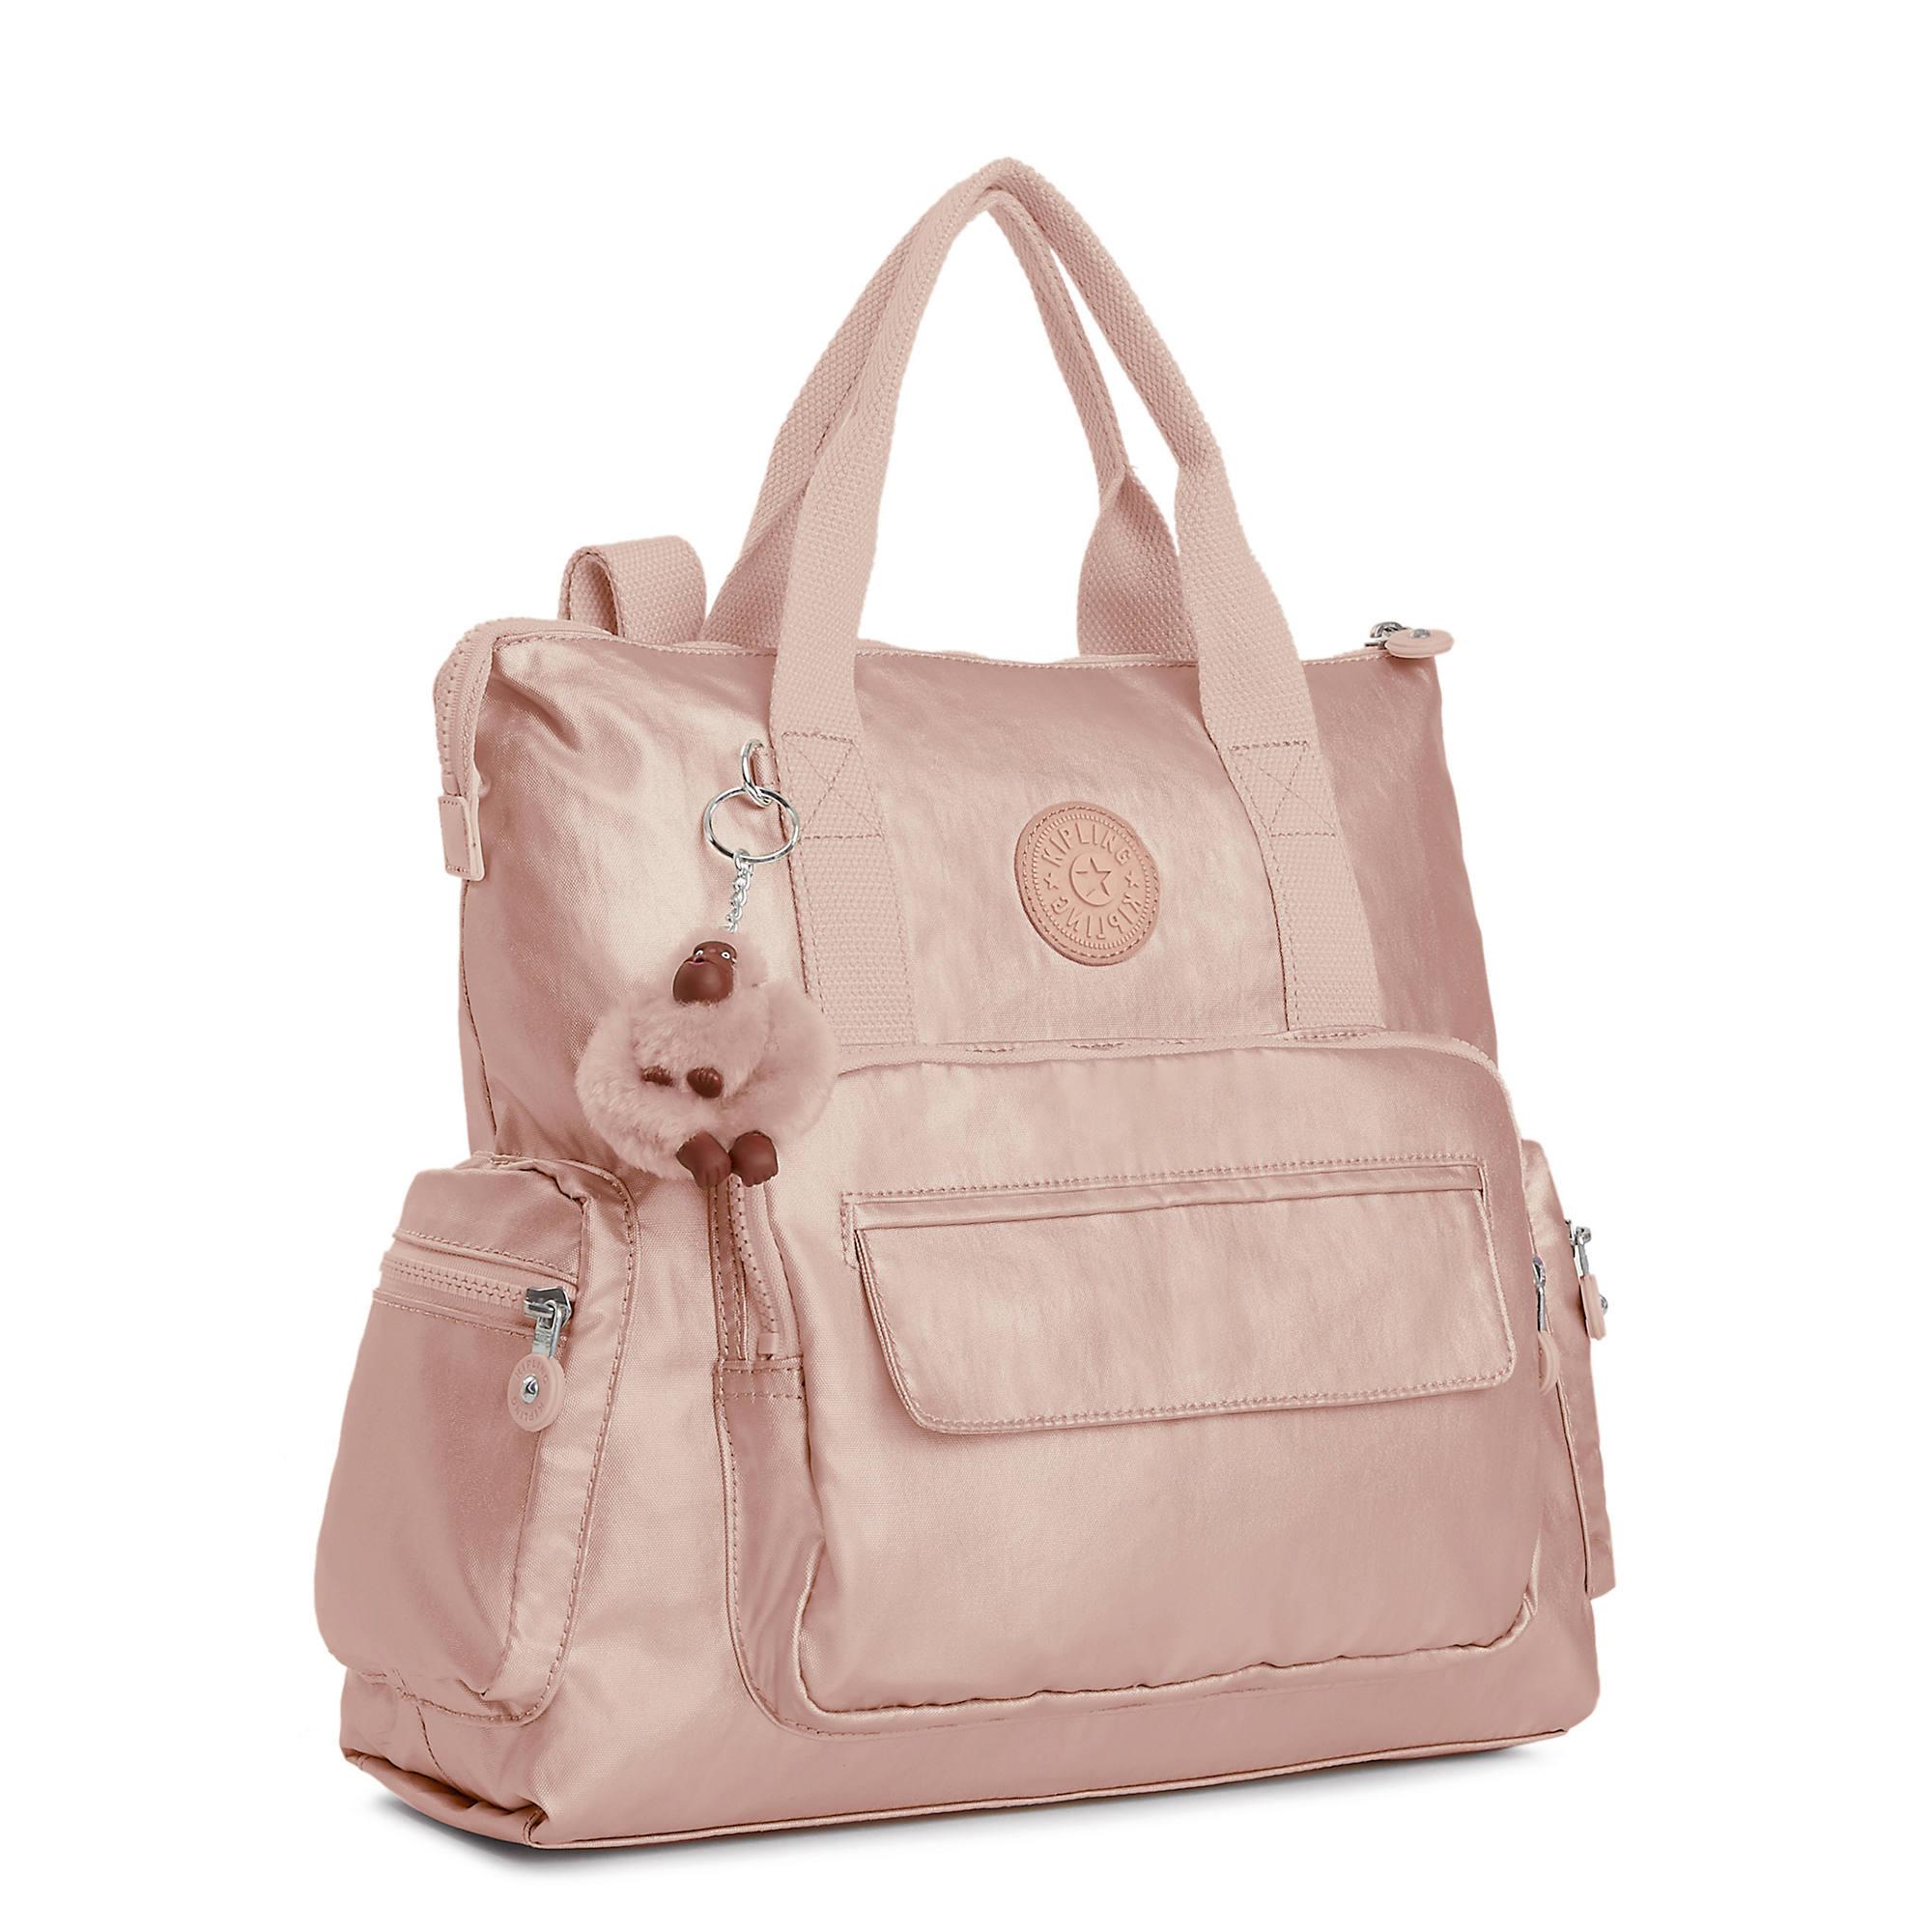 Kipling-Alvy-2-In-1-Convertible-Tote-Bag-Backpack miniatura 35